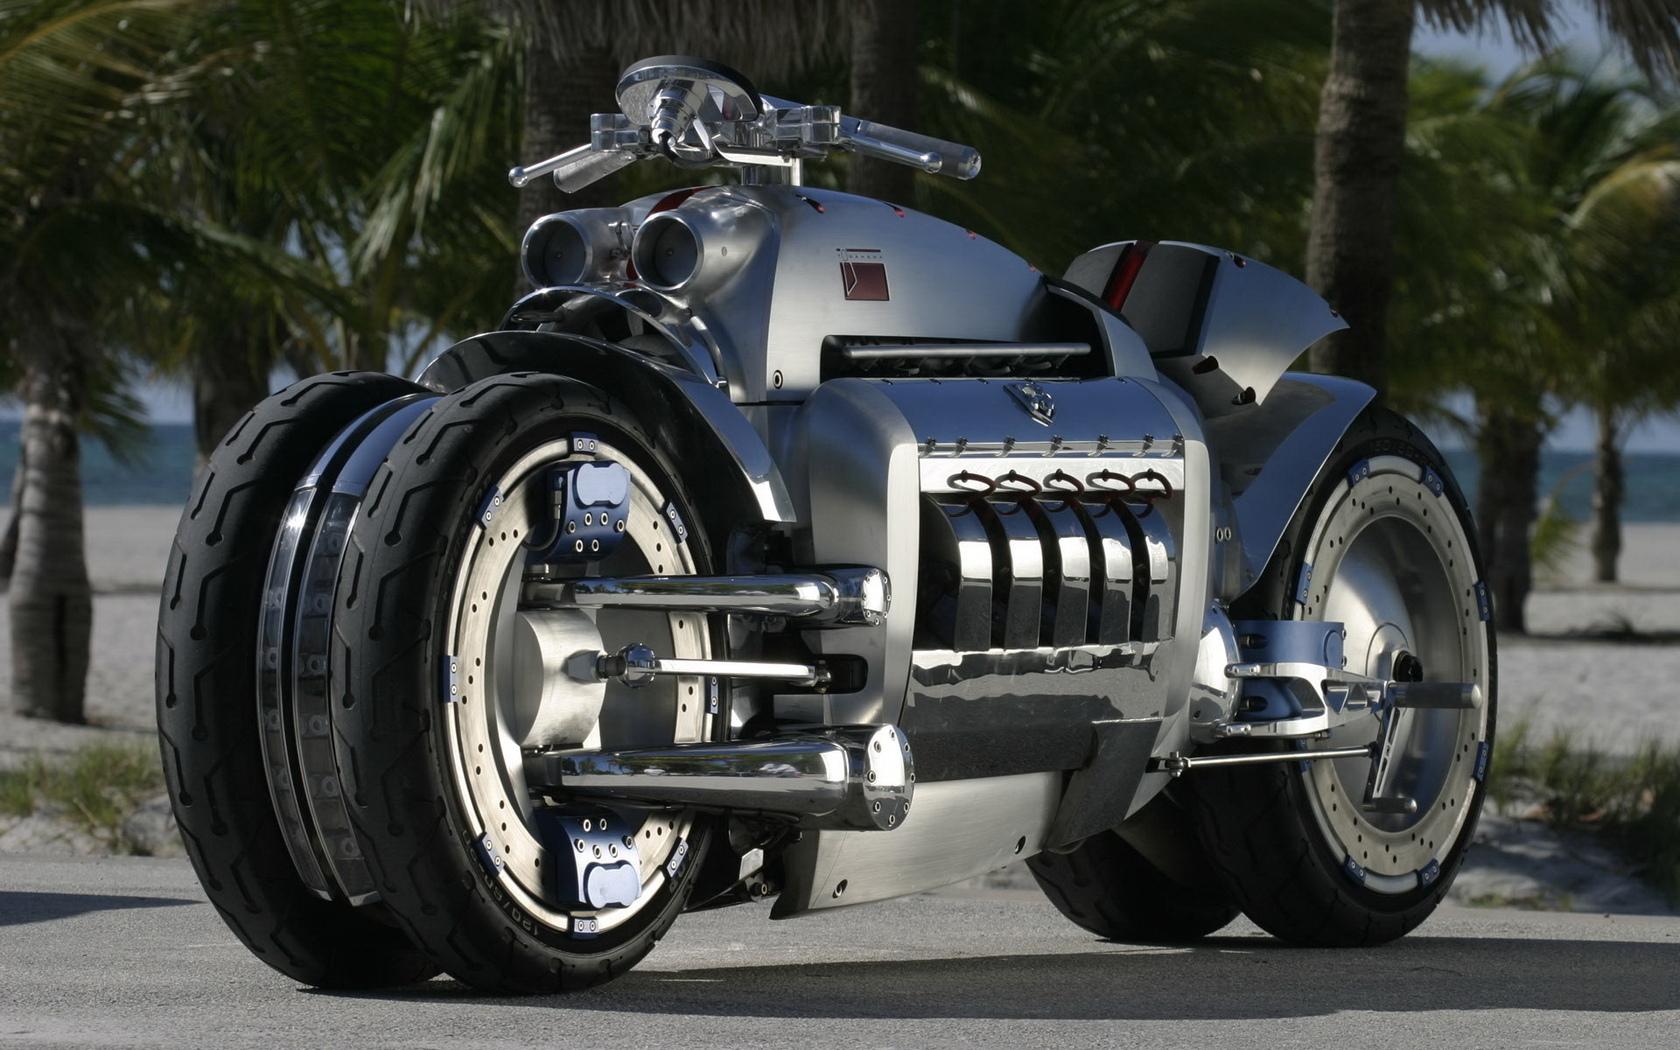 motorcycle modern powerful motorbike wallpapers motorcycles motocycles motorbikes cars